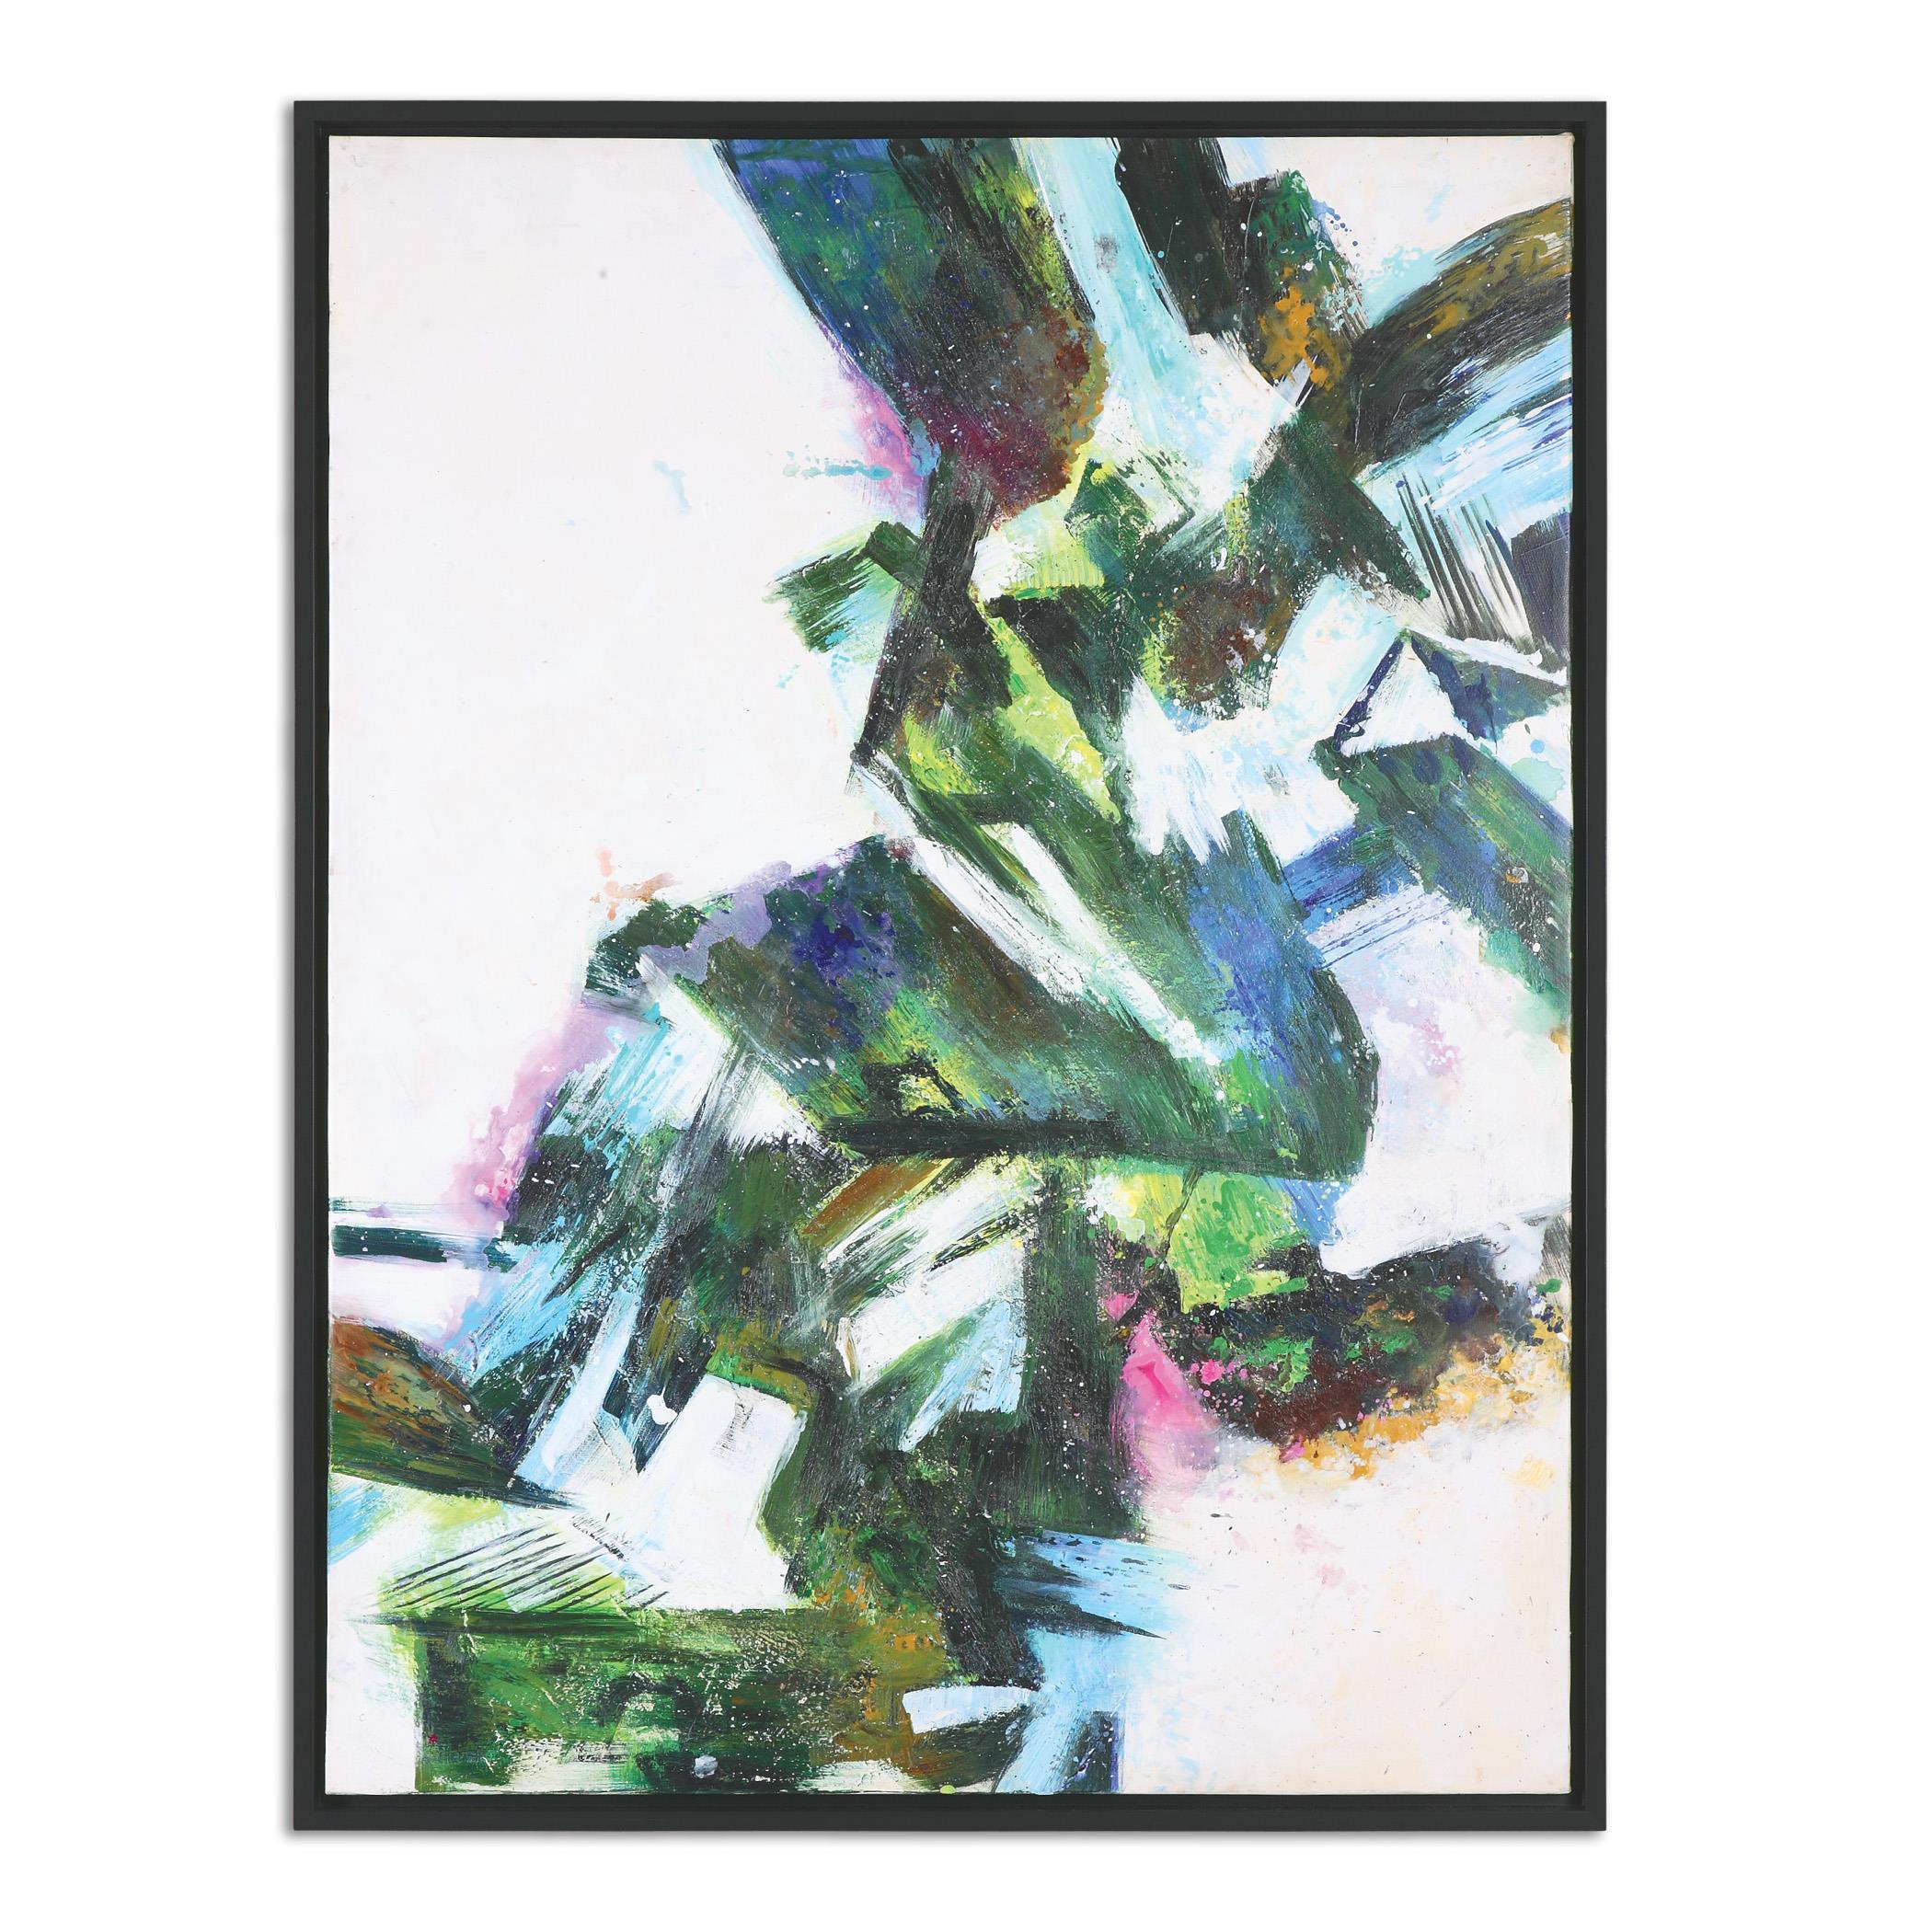 Uttermost Art Gems Modern Art - Item Number: 31310